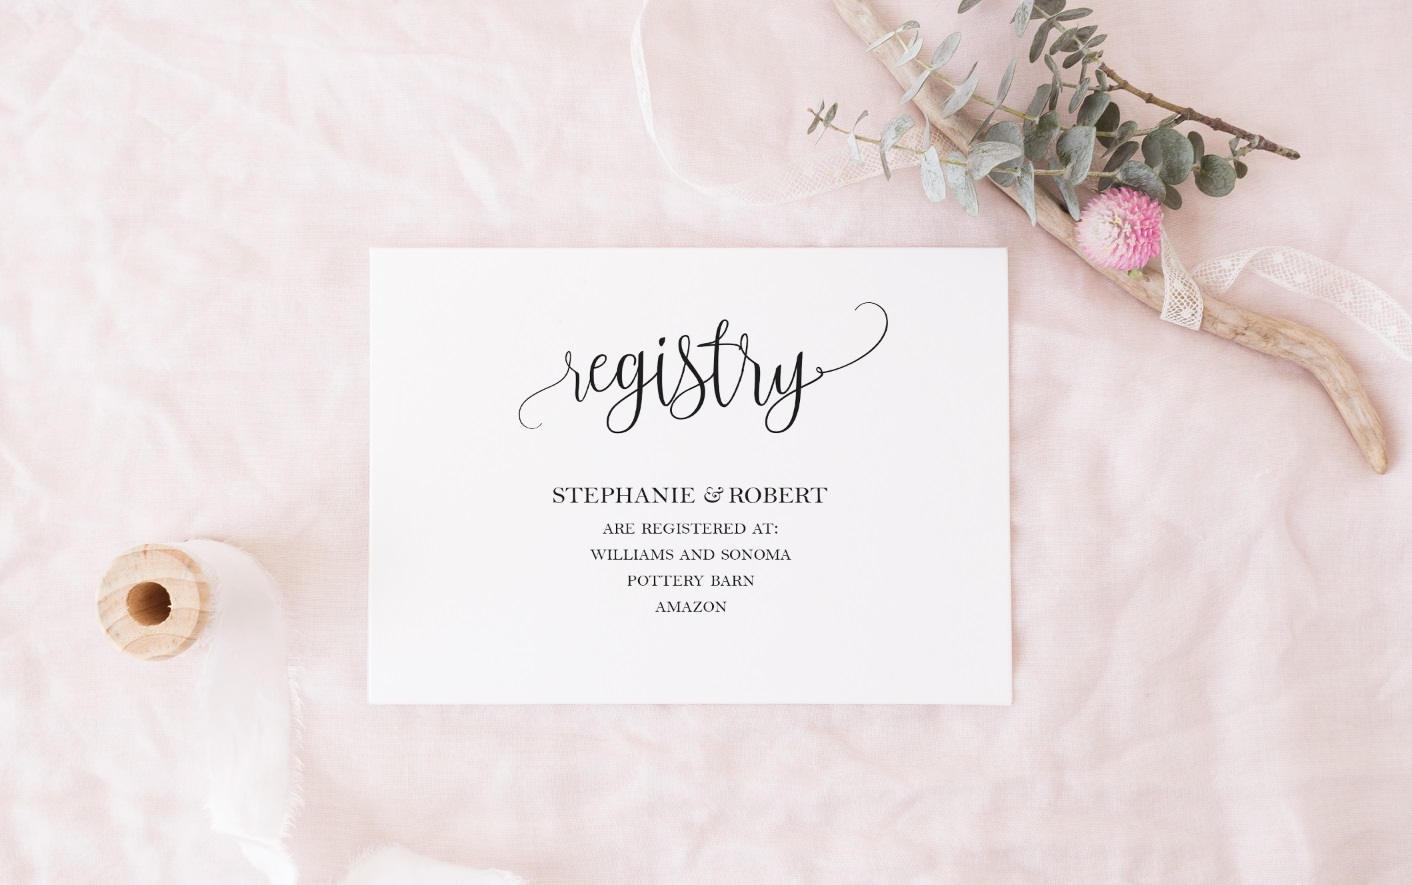 Wedding Registry Invitation: Black And White Registry Cards Template DIY Gift Registry Card